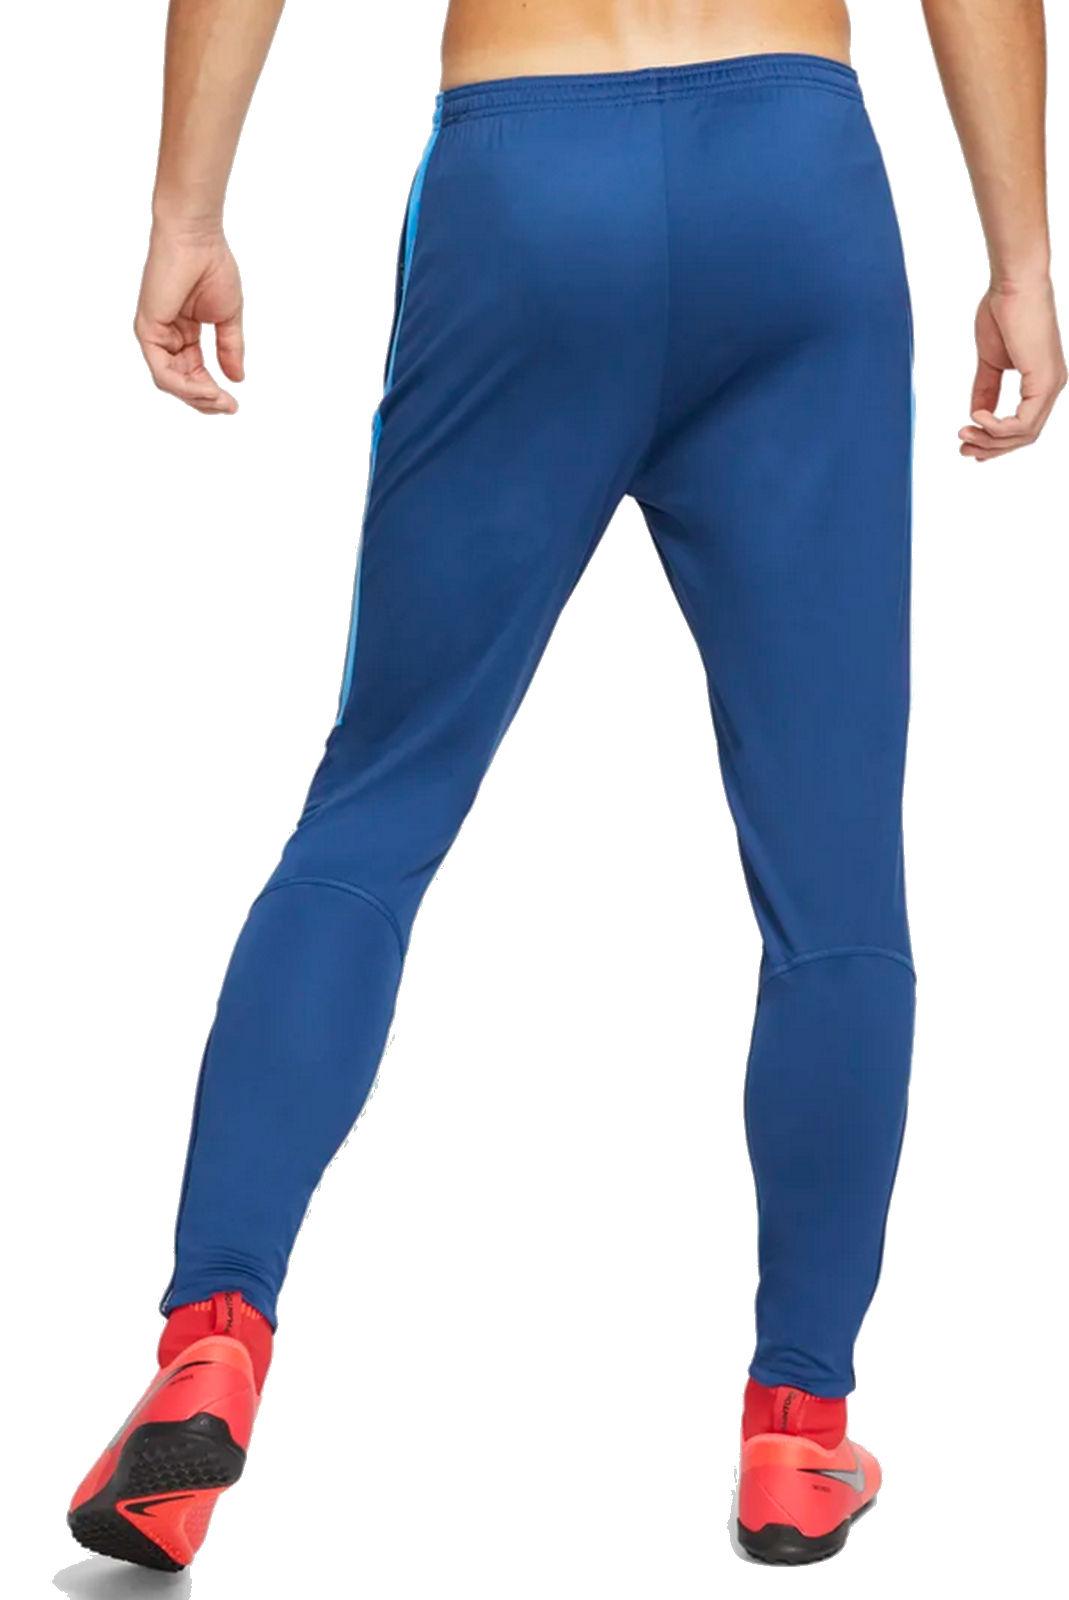 Nike Herren Trainingshose Fußballhose NK Dry-Fit ACADEMY PANT schwarz weiß